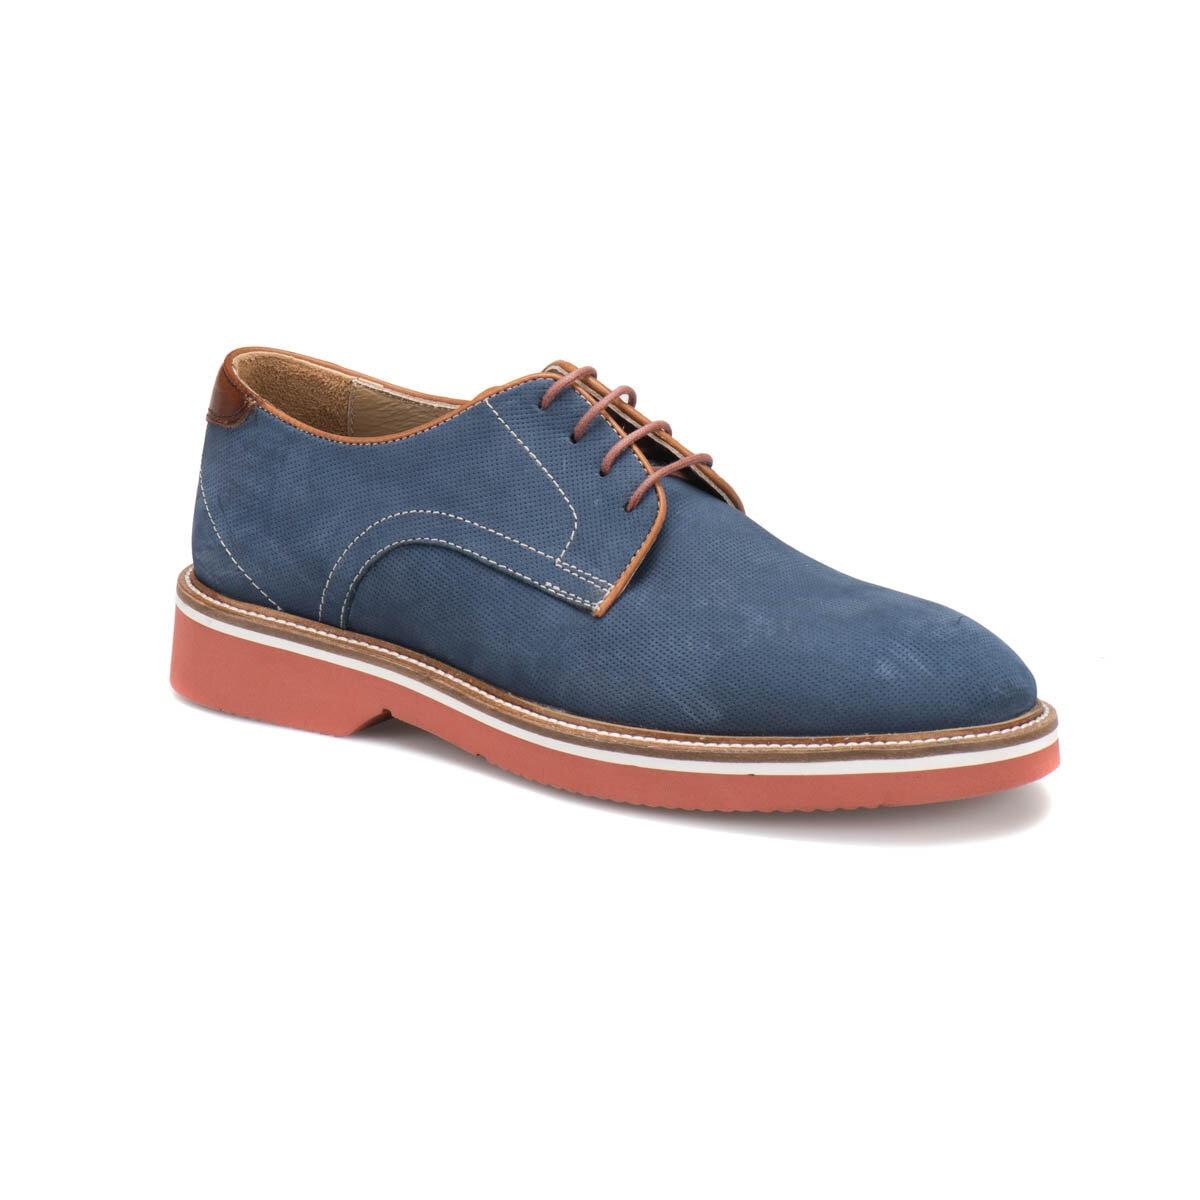 FLO 193 M 1506 Navy Blue Men 'S Modern Shoes Cordovan